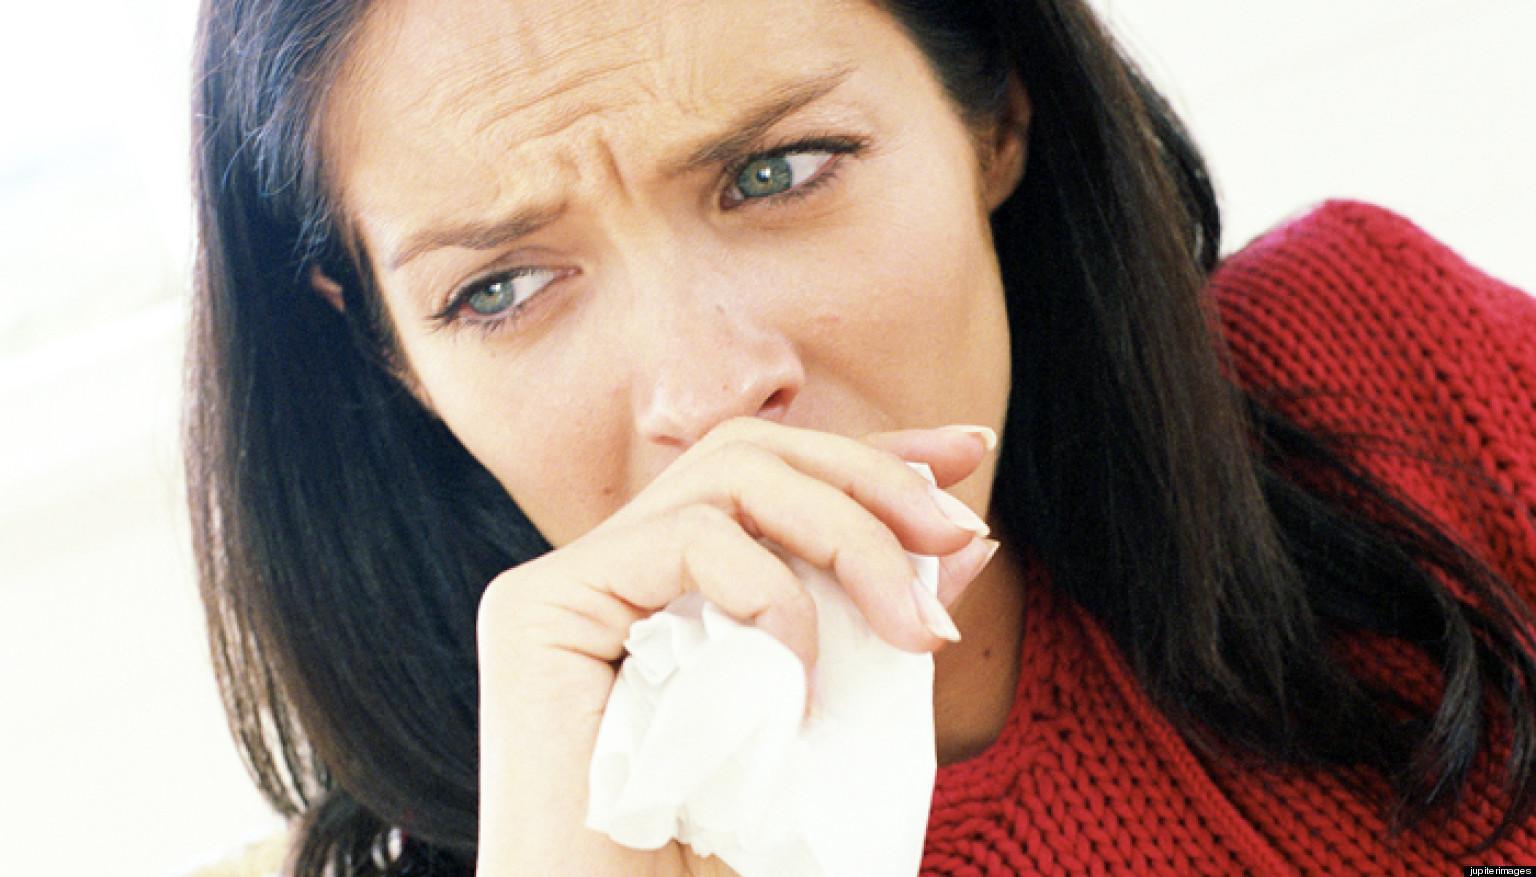 Ржавая мокрота — при каких заболеваниях?